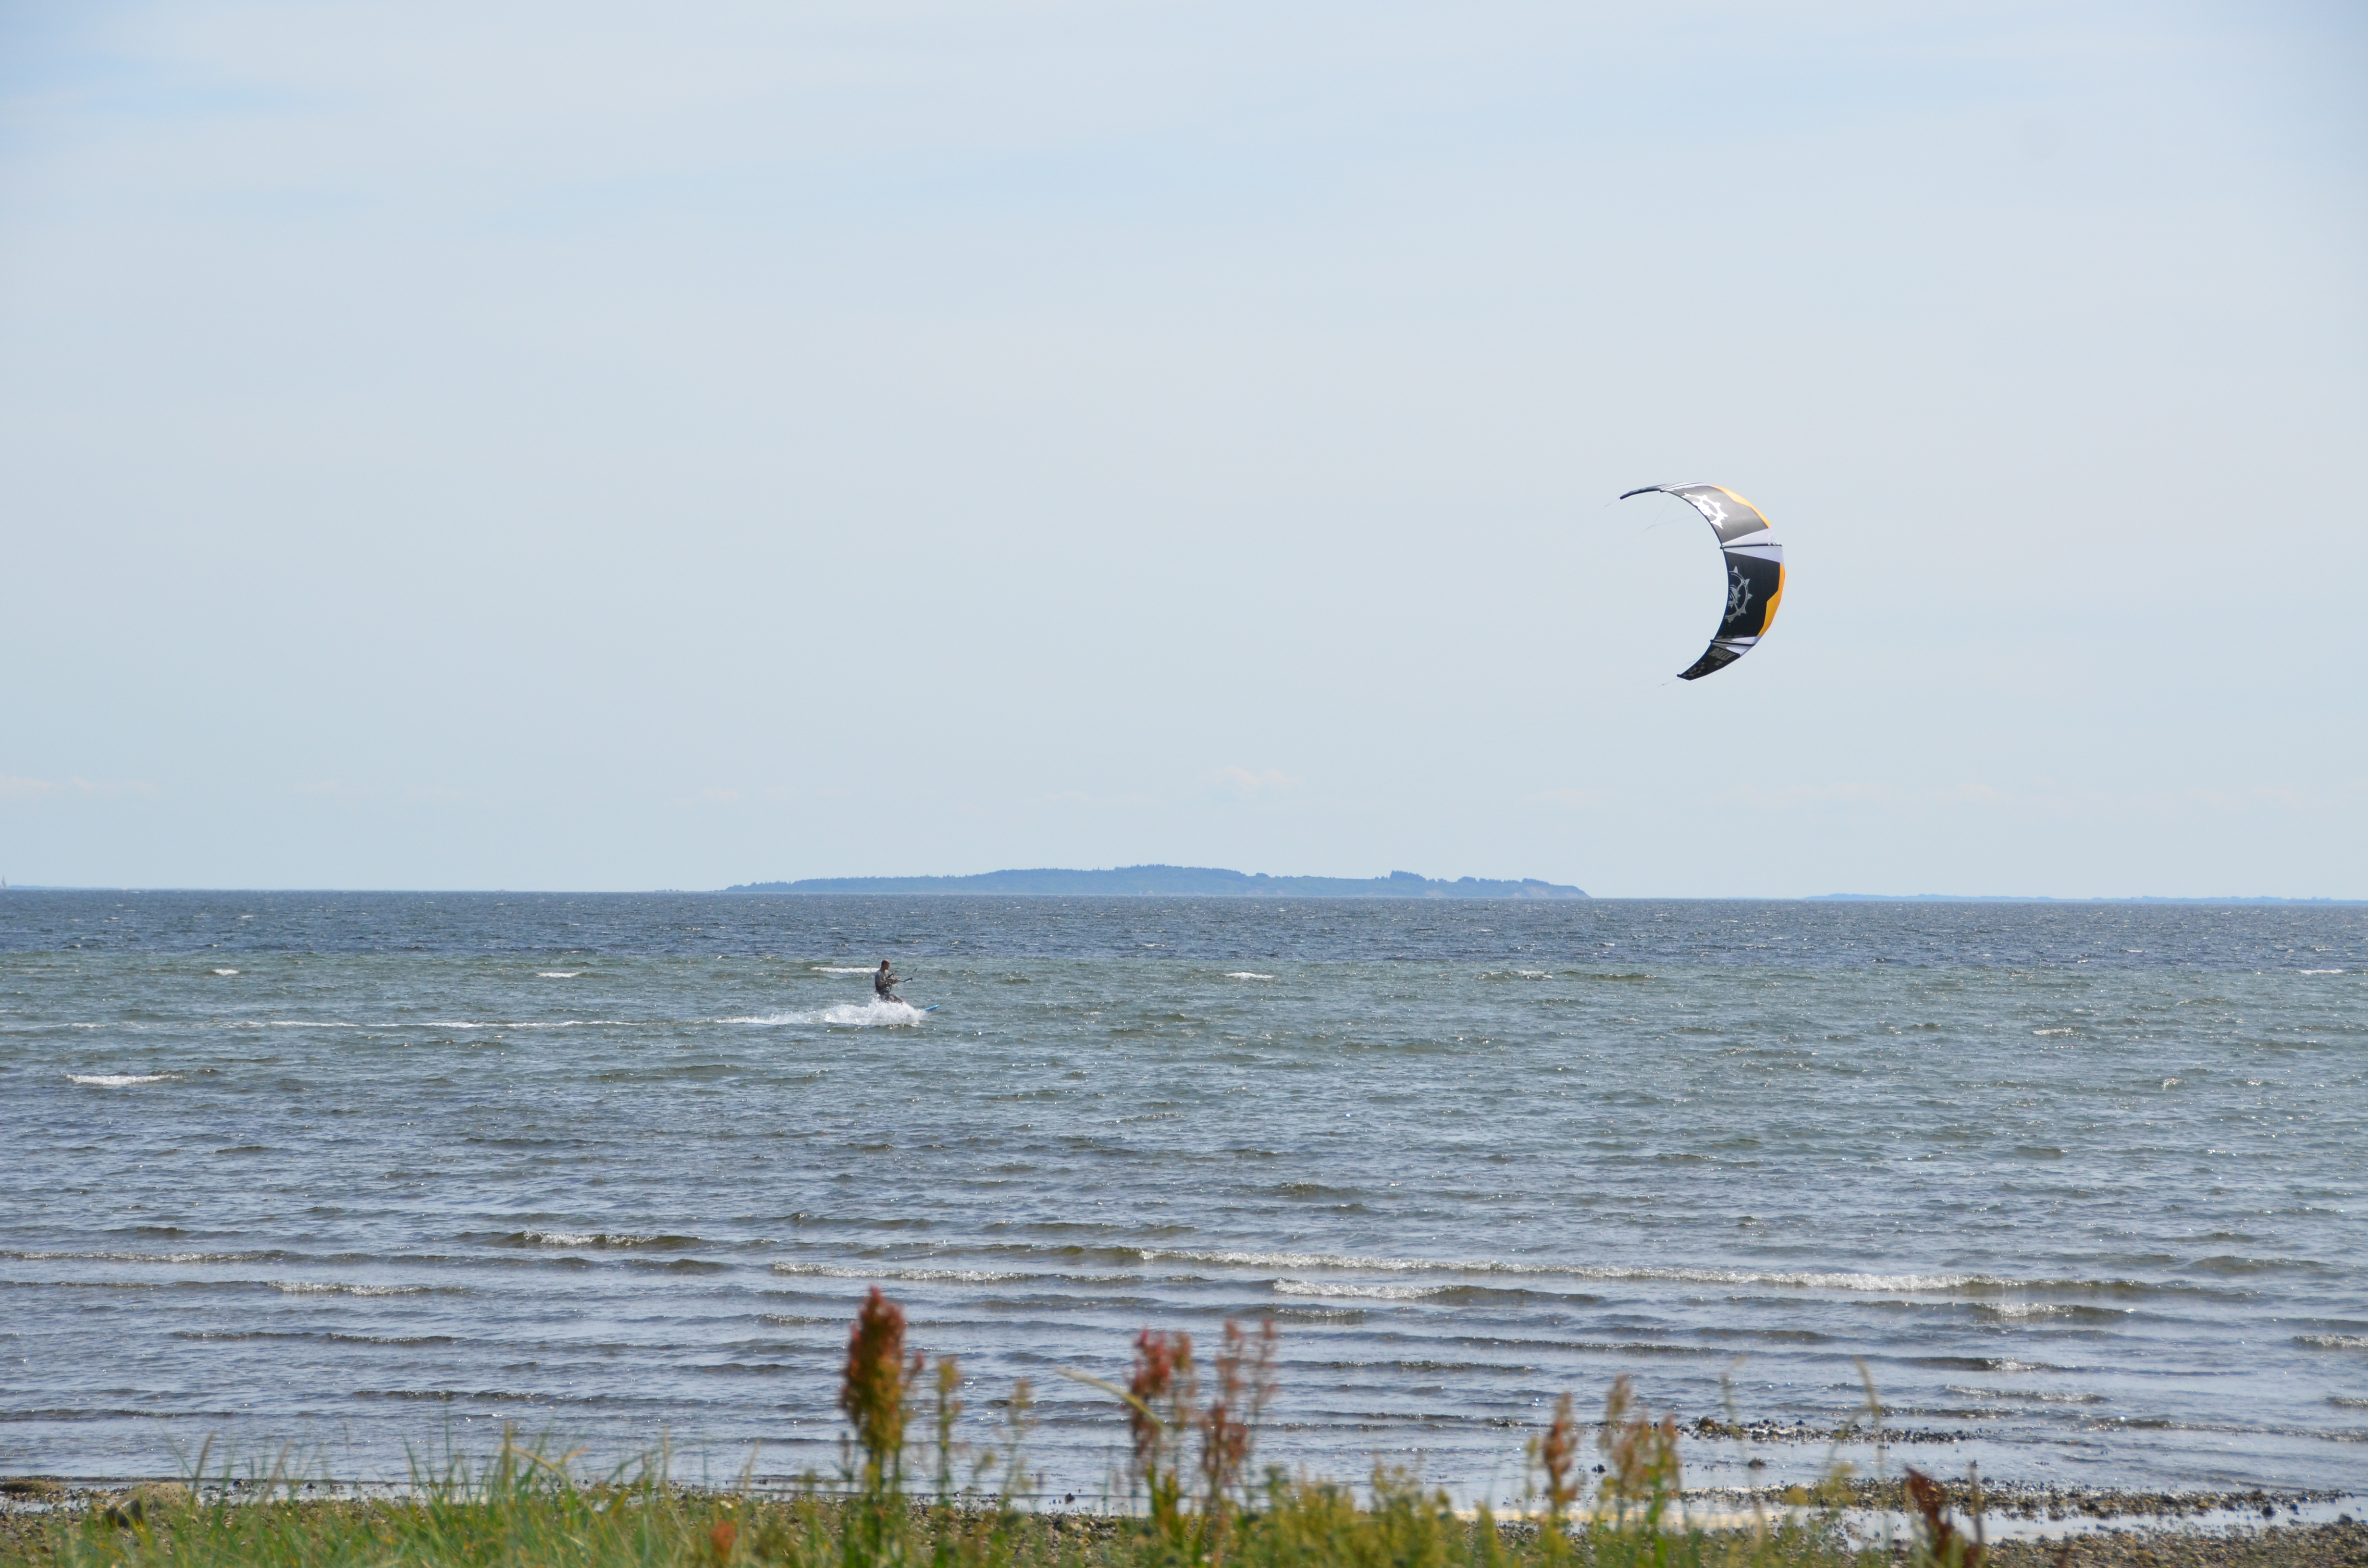 Kitesurfing Øsløs